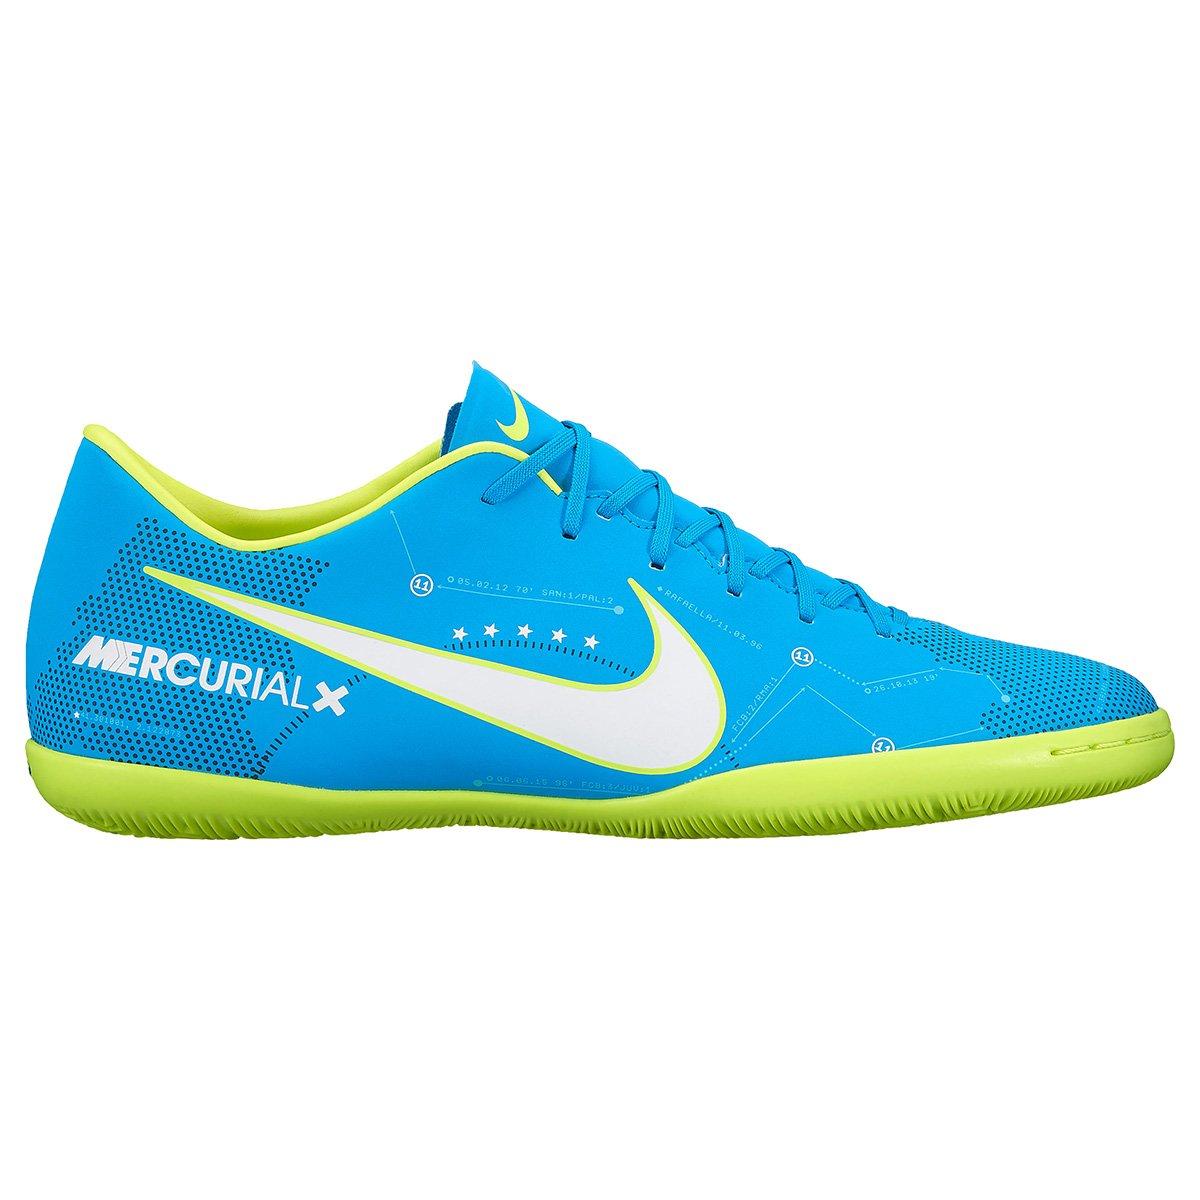 26c4f2c9d7 Chuteira Futsal Nike Mercurial Victory 6 Neymar Jr IC